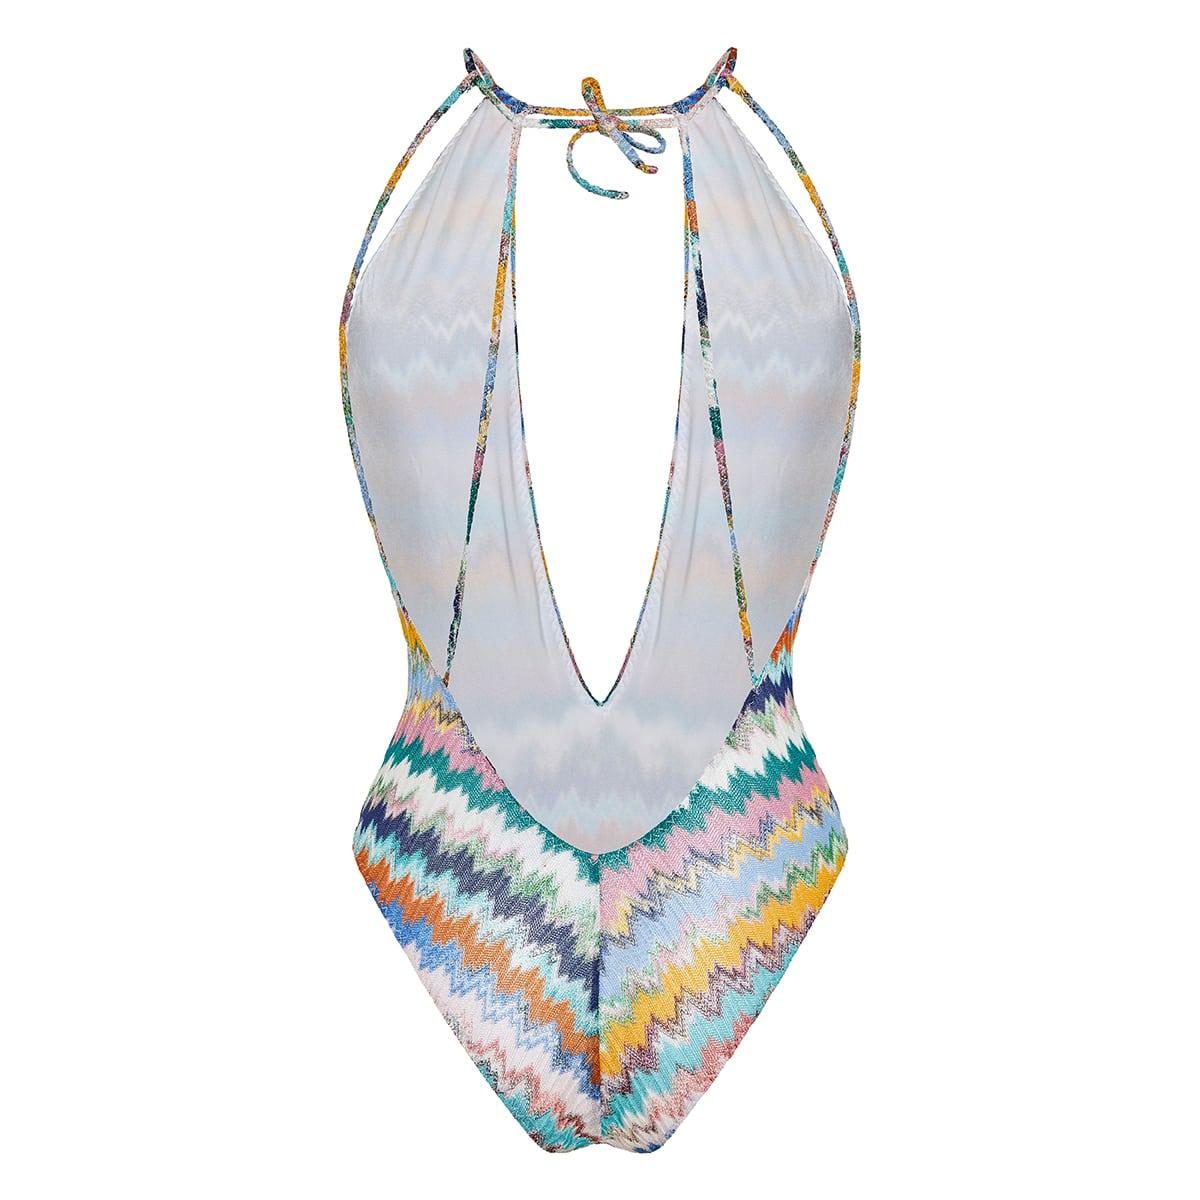 Chevron-knit halterneck swimsuit